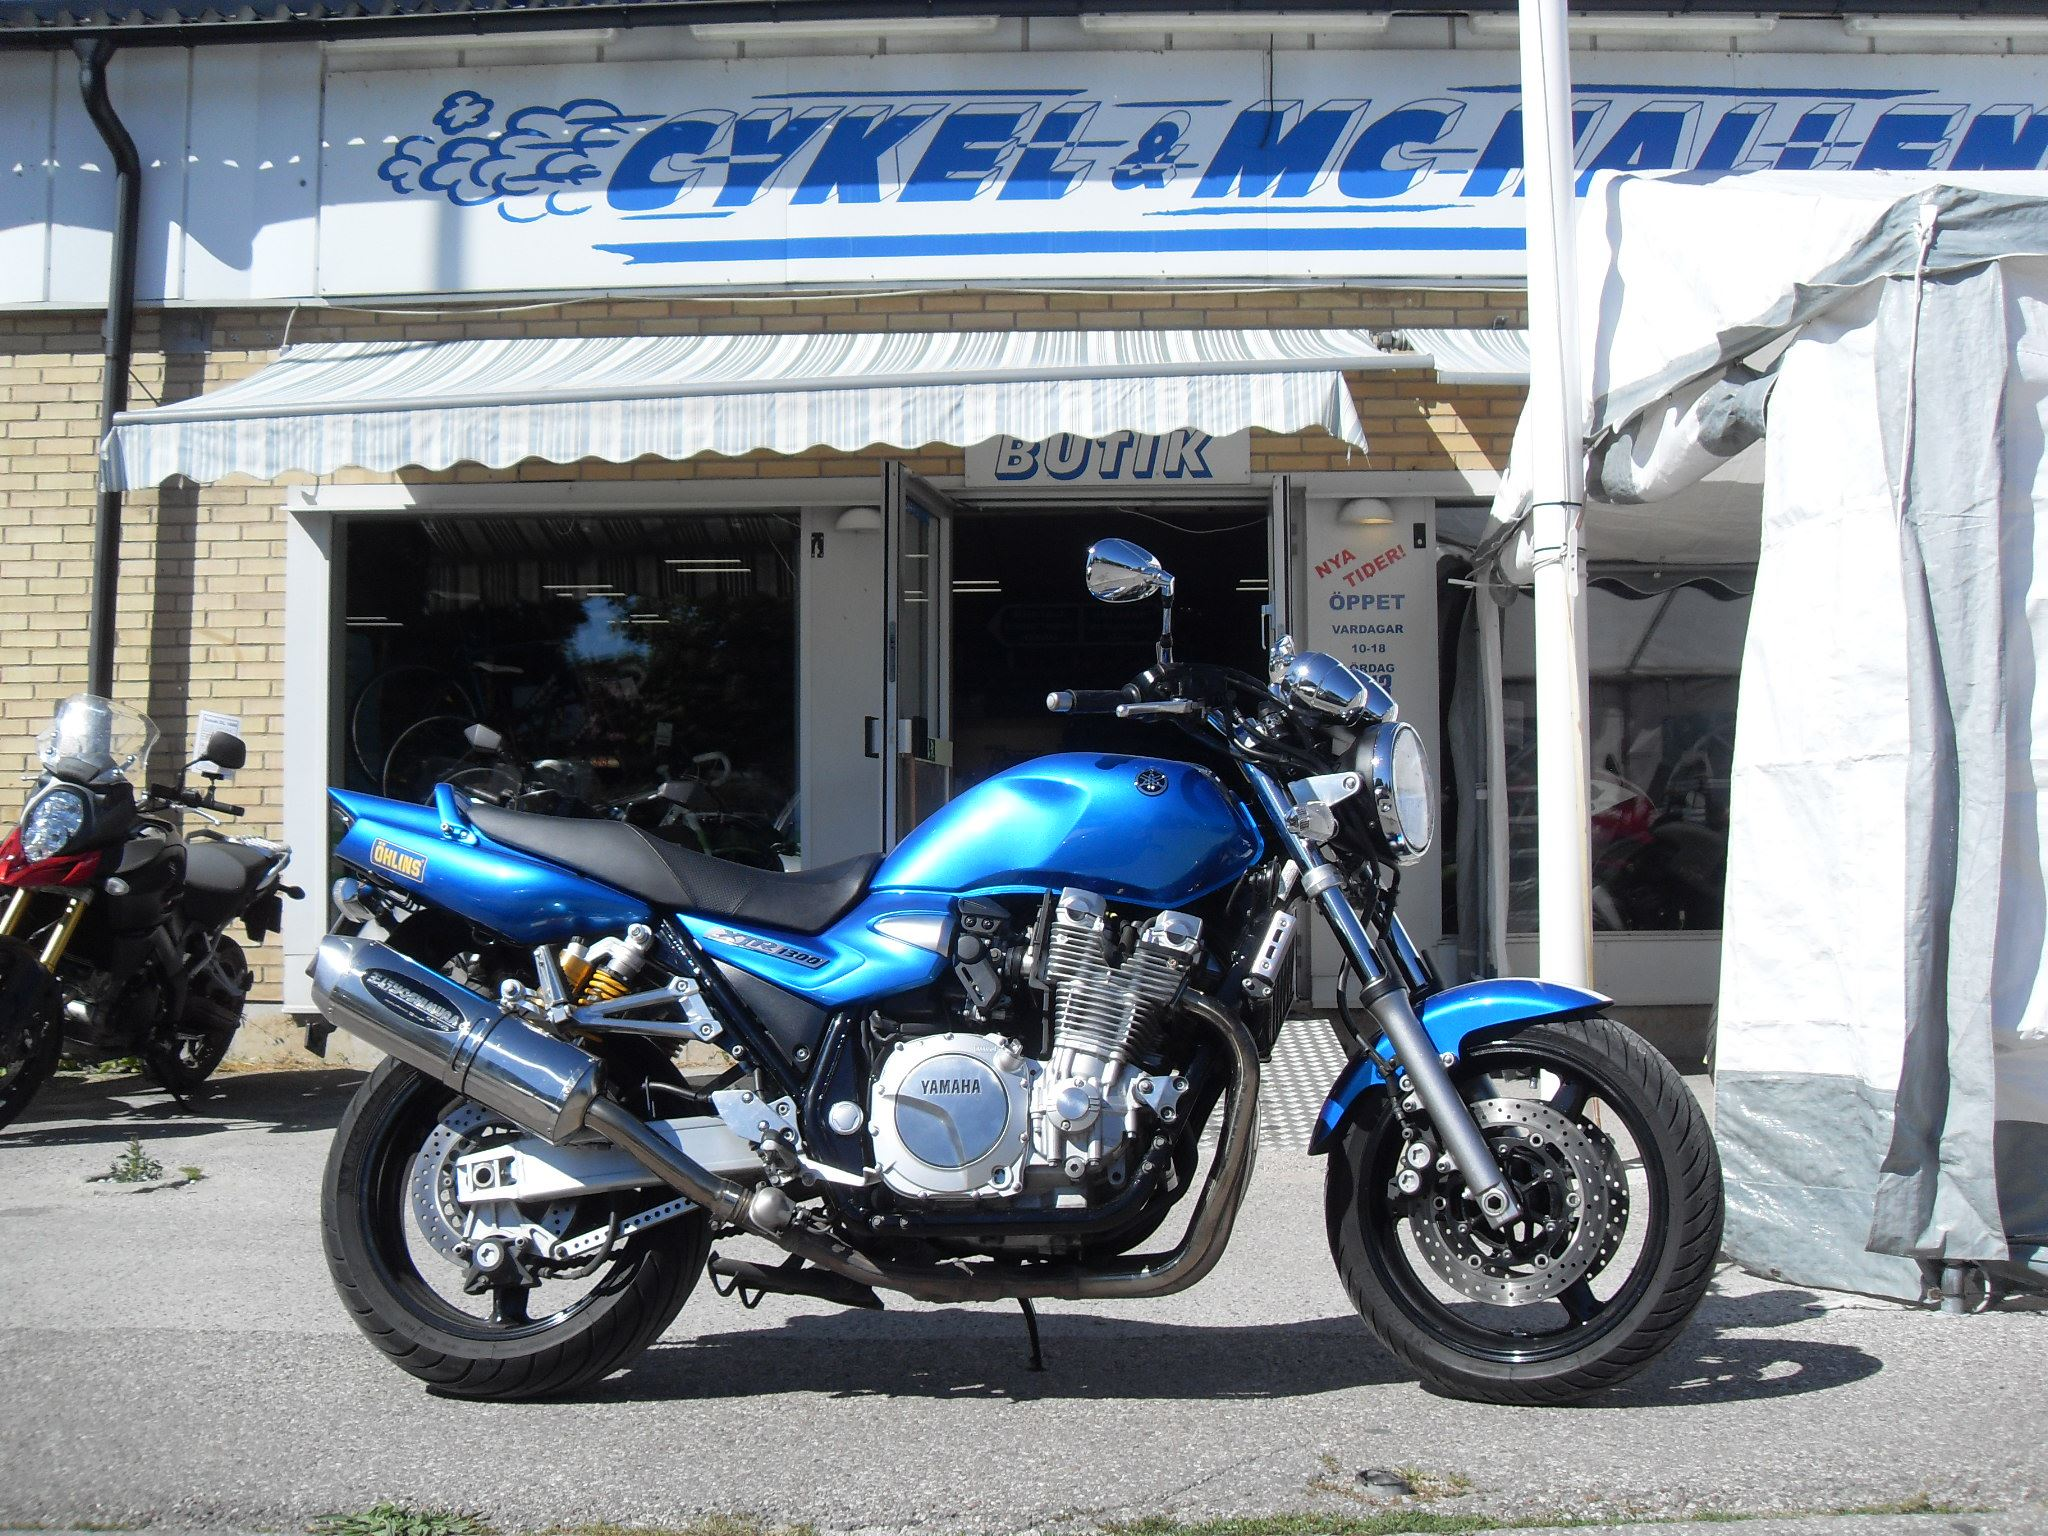 Klass C - Yamaha XJR 1300